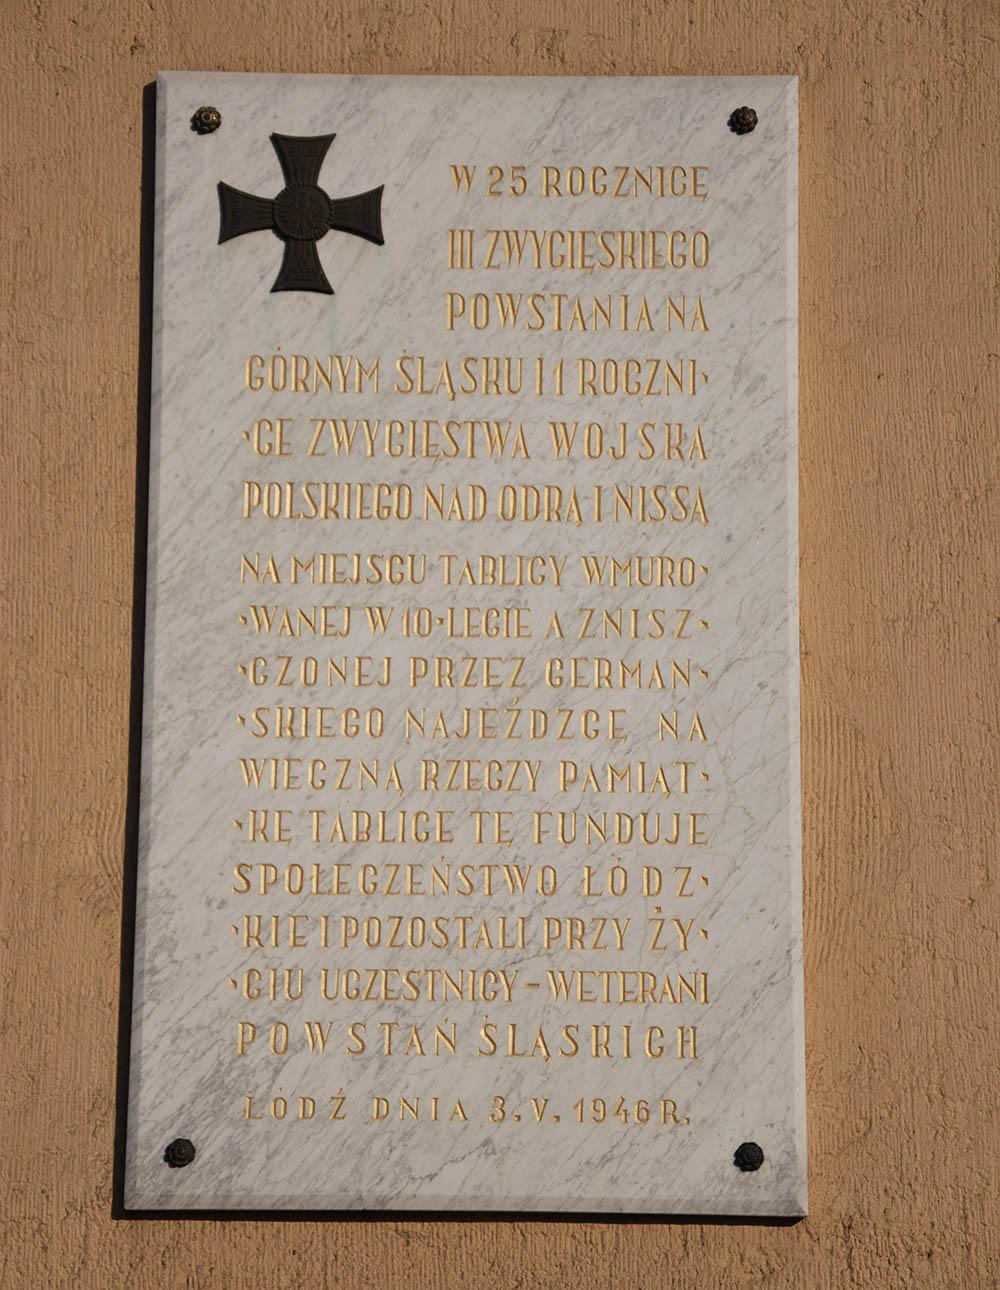 Plaques 3rd Silesian Uprising Lodz